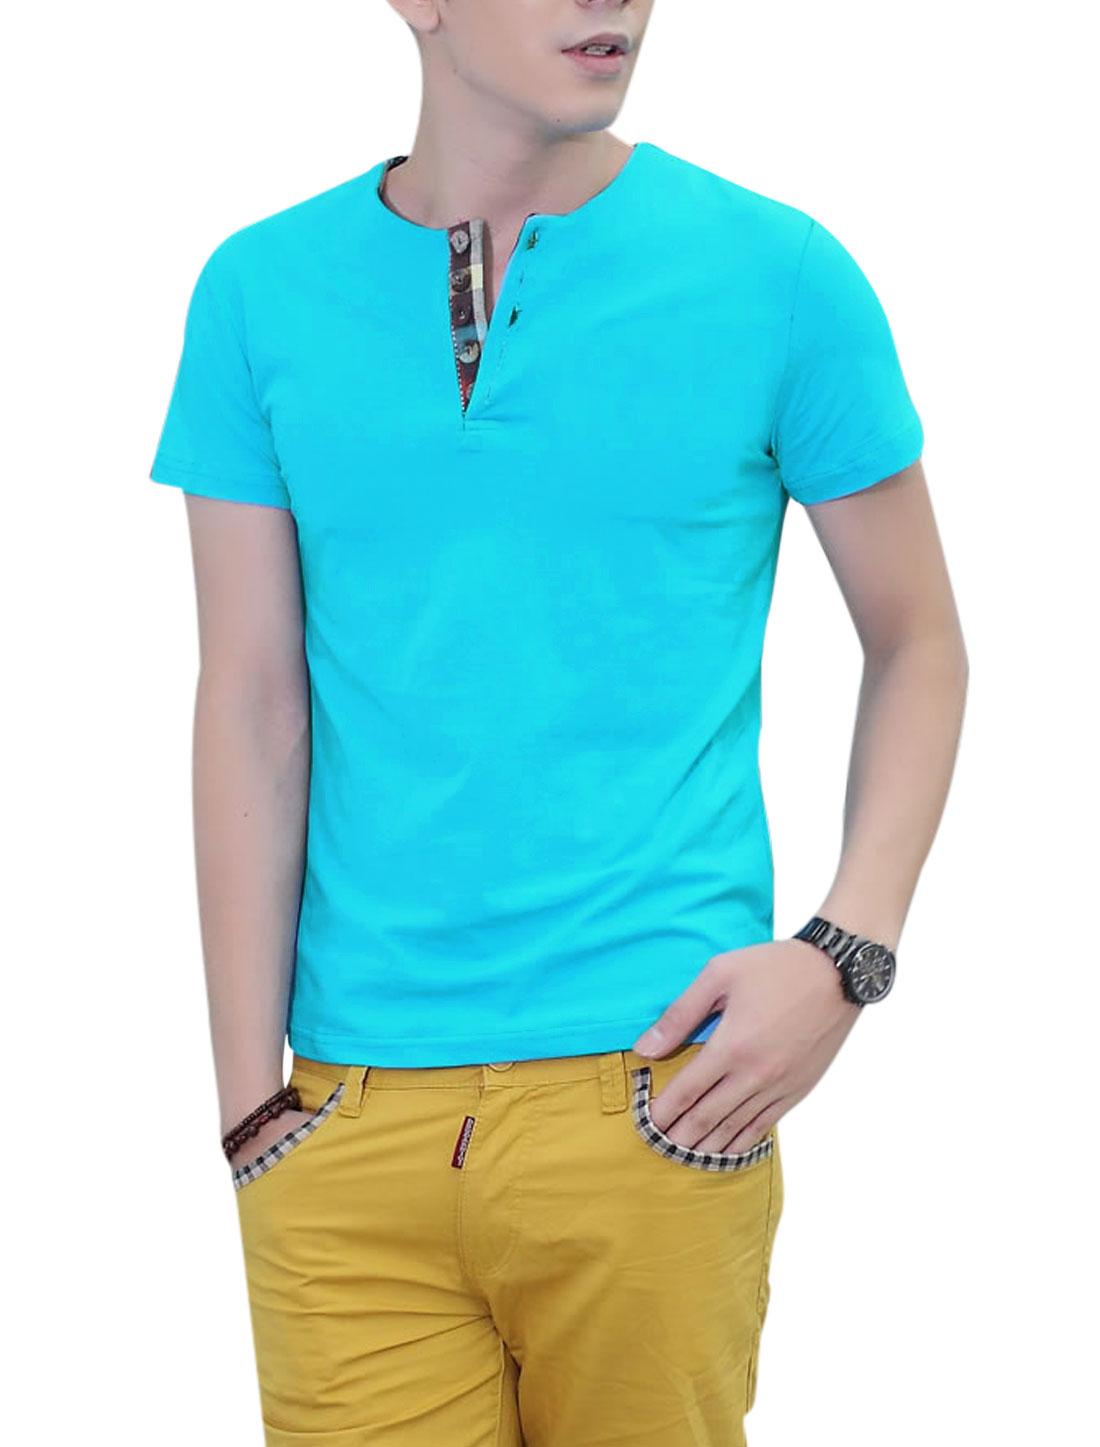 Round Neck Short Sleeve 1/4 Placket Soft T-Shirt for Men Sky Blue L